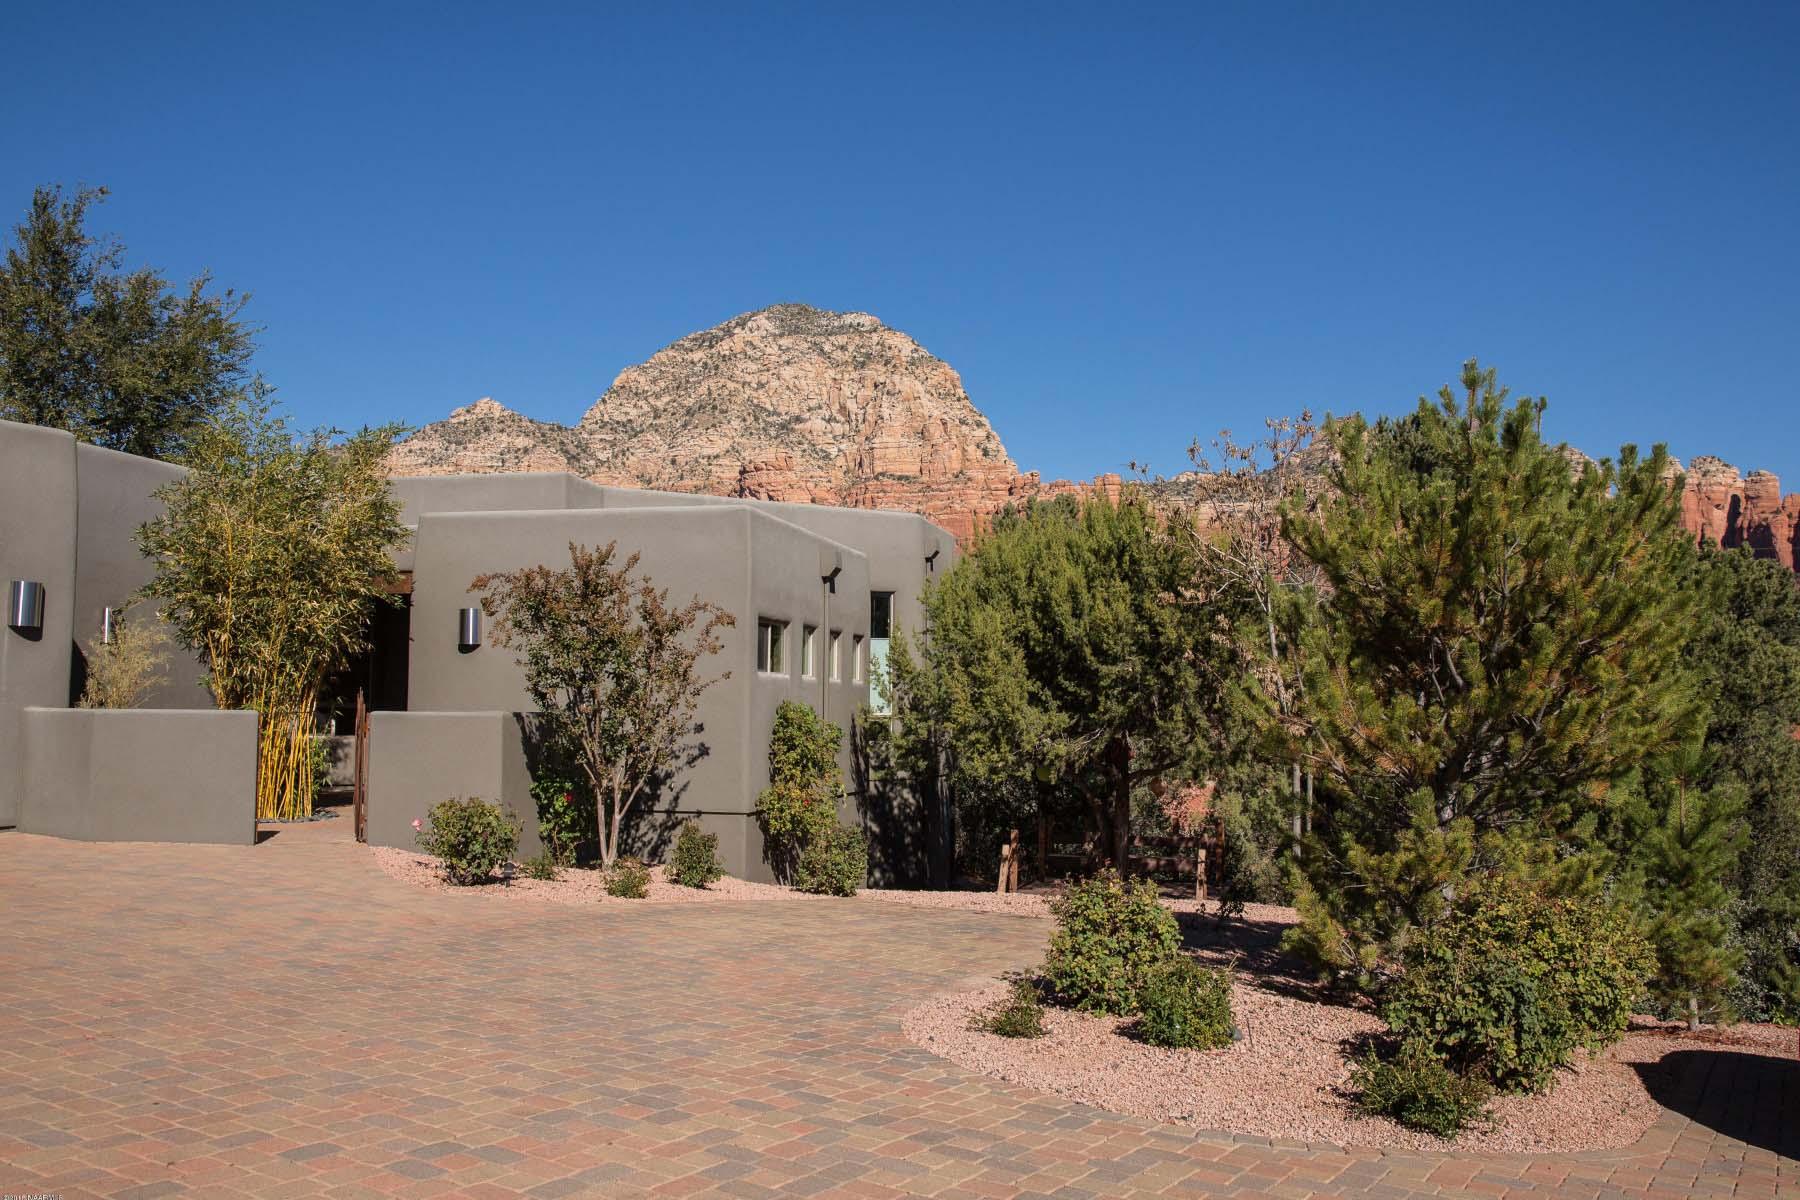 Einfamilienhaus für Verkauf beim Santa Fe style home sits on an elevated lot with panoramic red rock views. 265 Goodrow LN Sedona, Arizona 86336 Vereinigte Staaten